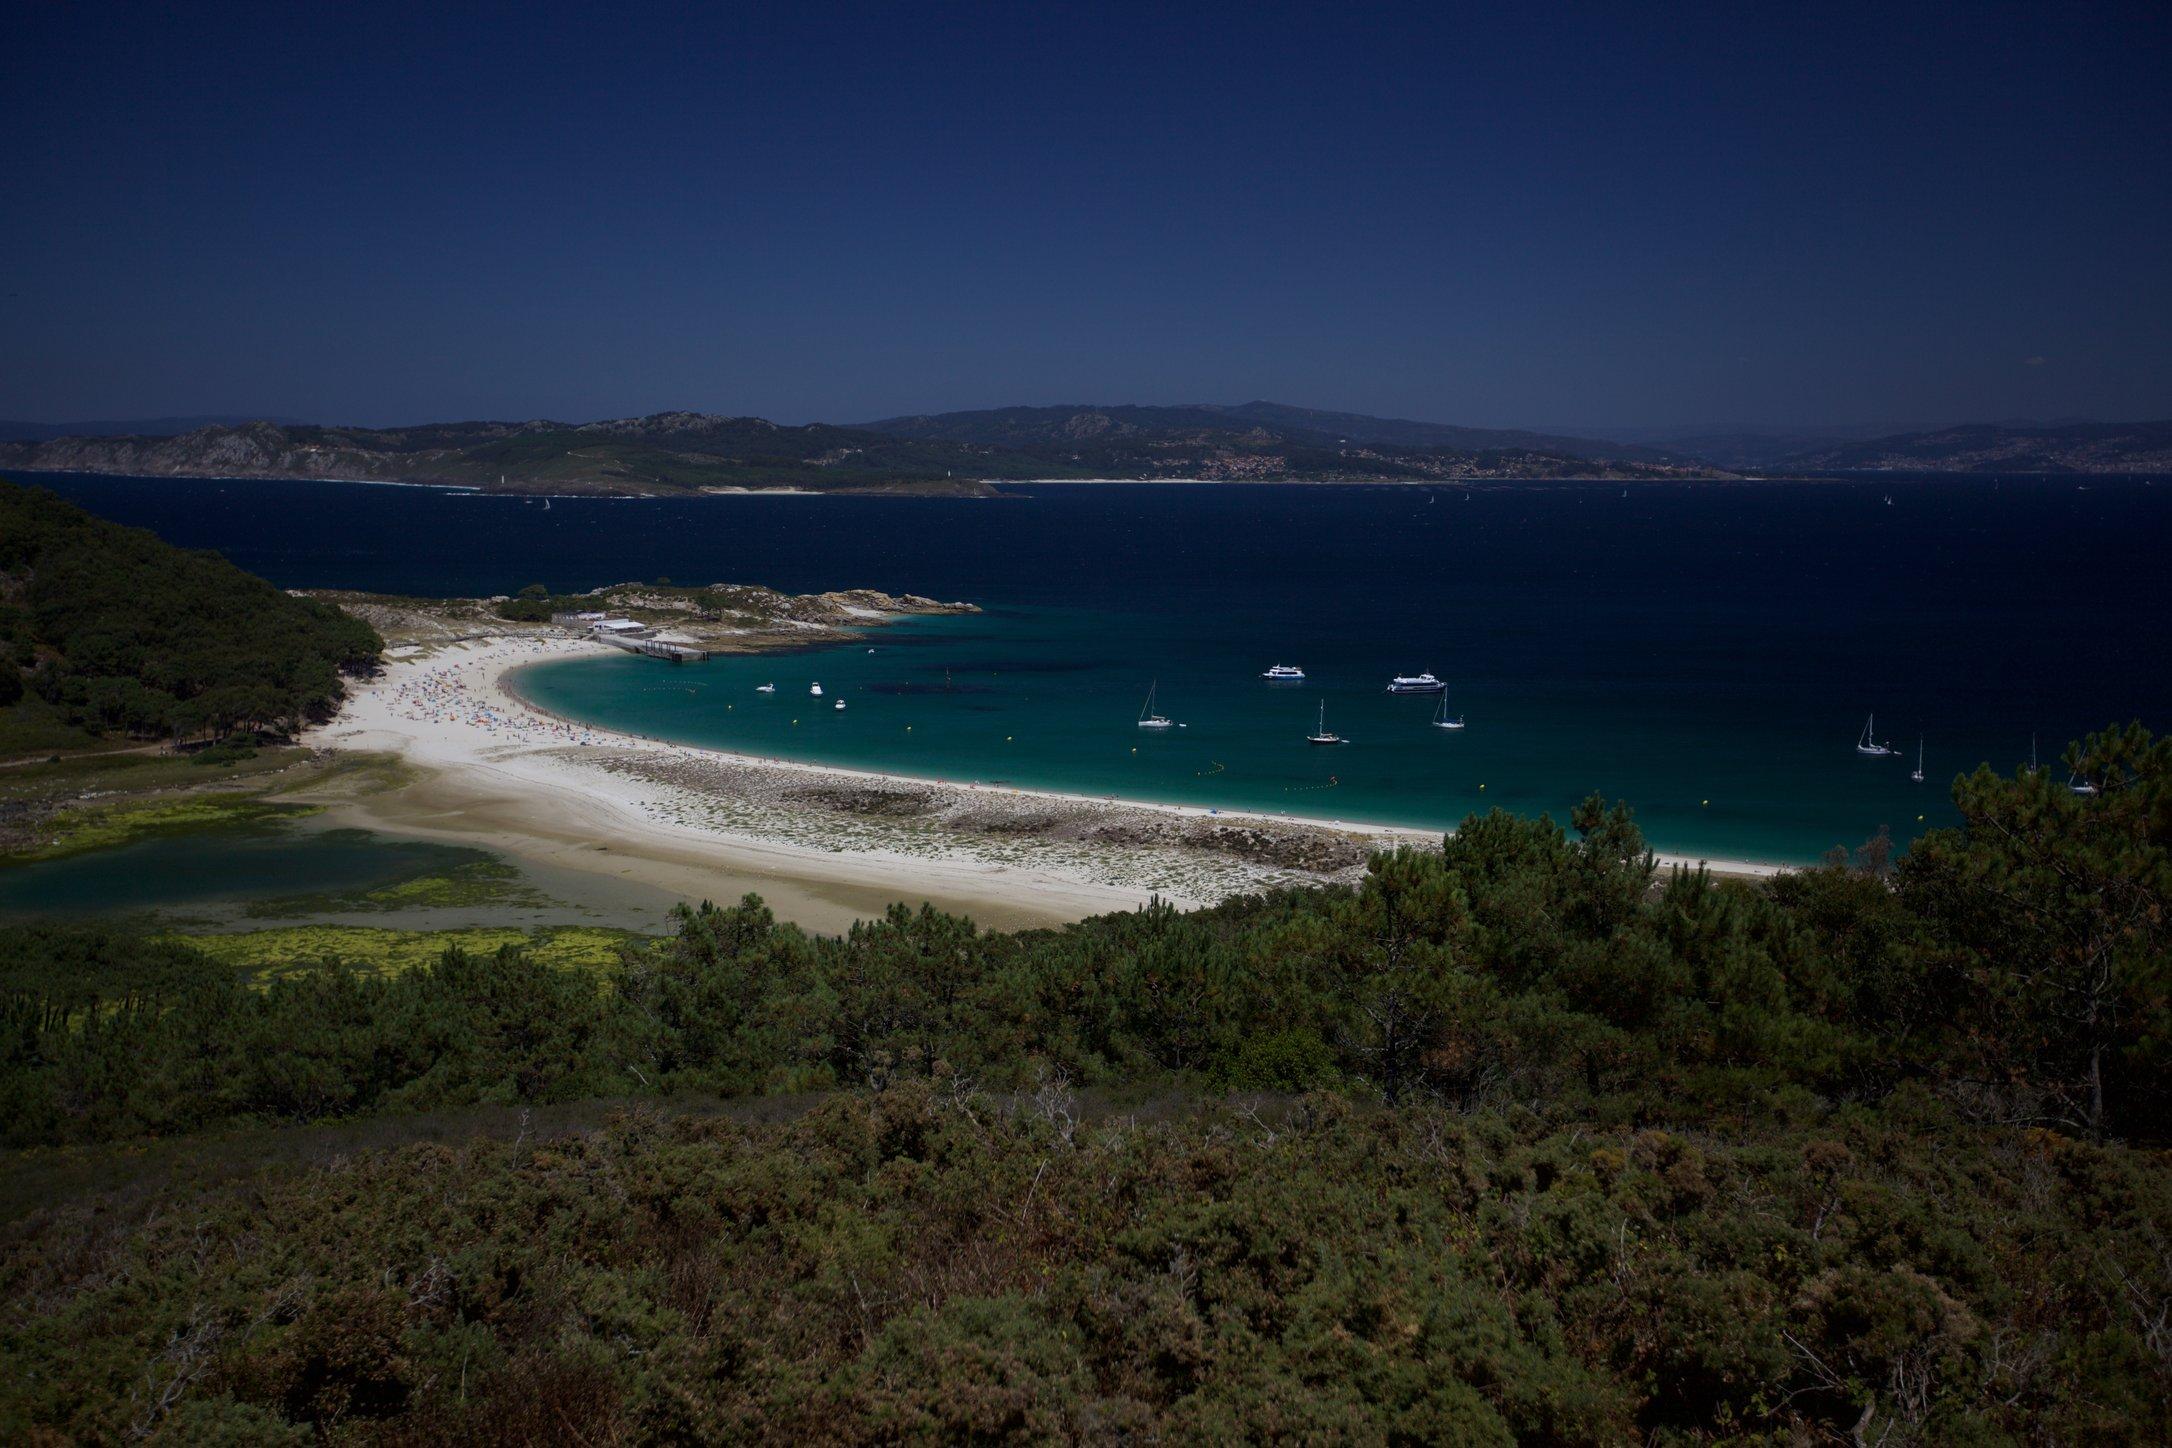 Galicia_065.jpg